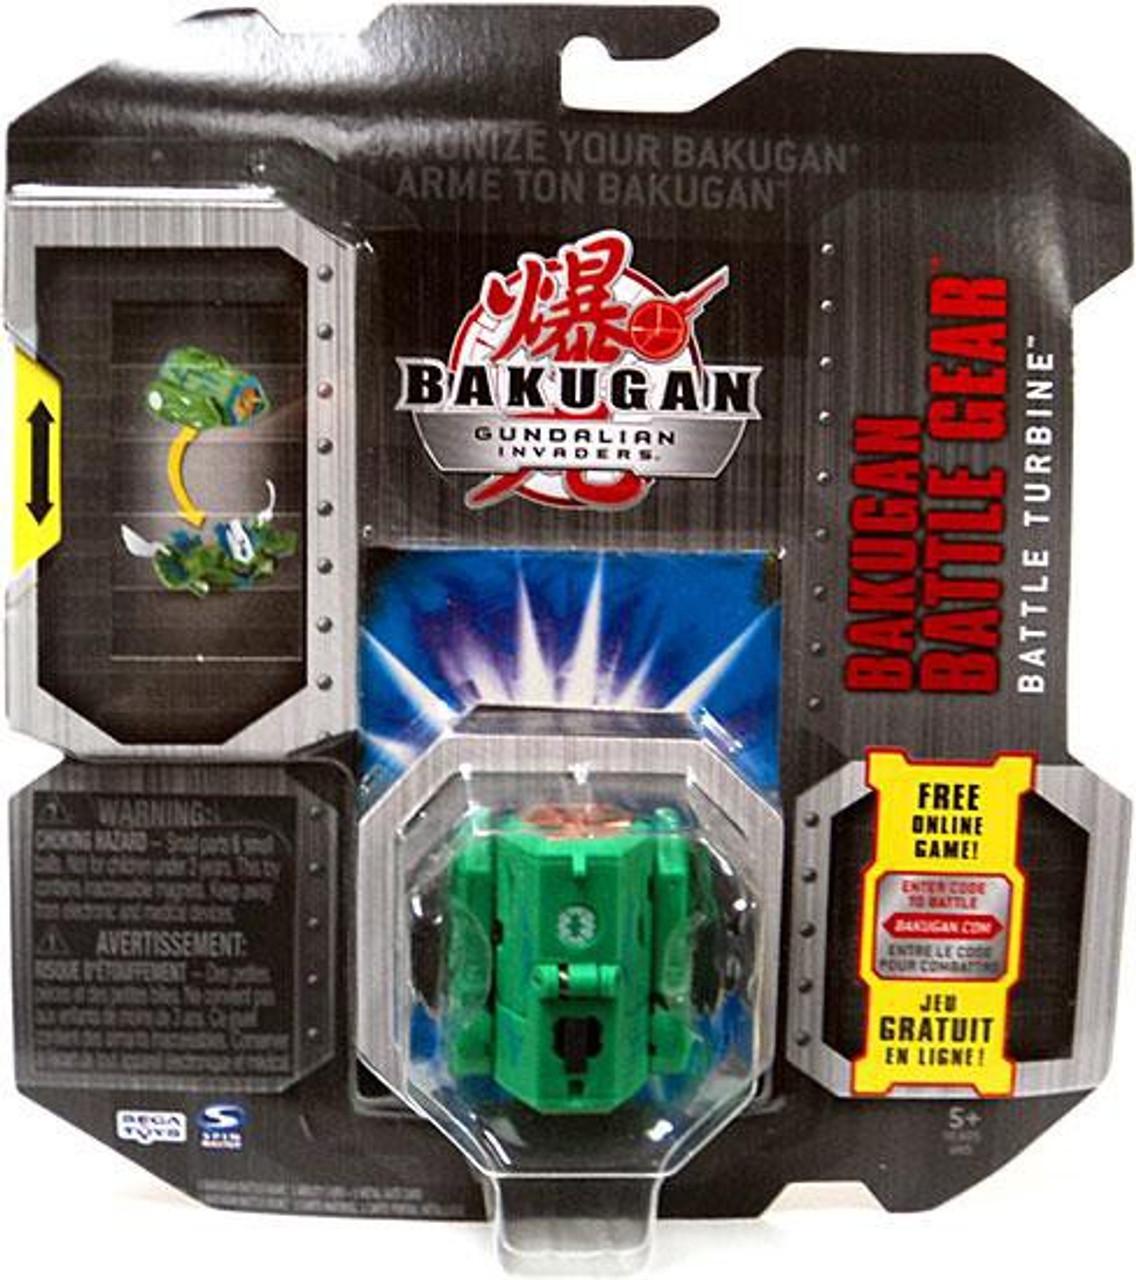 Gundalian Invaders Bakugan Battle Gear Zephyroz Battle Turbine [Green]